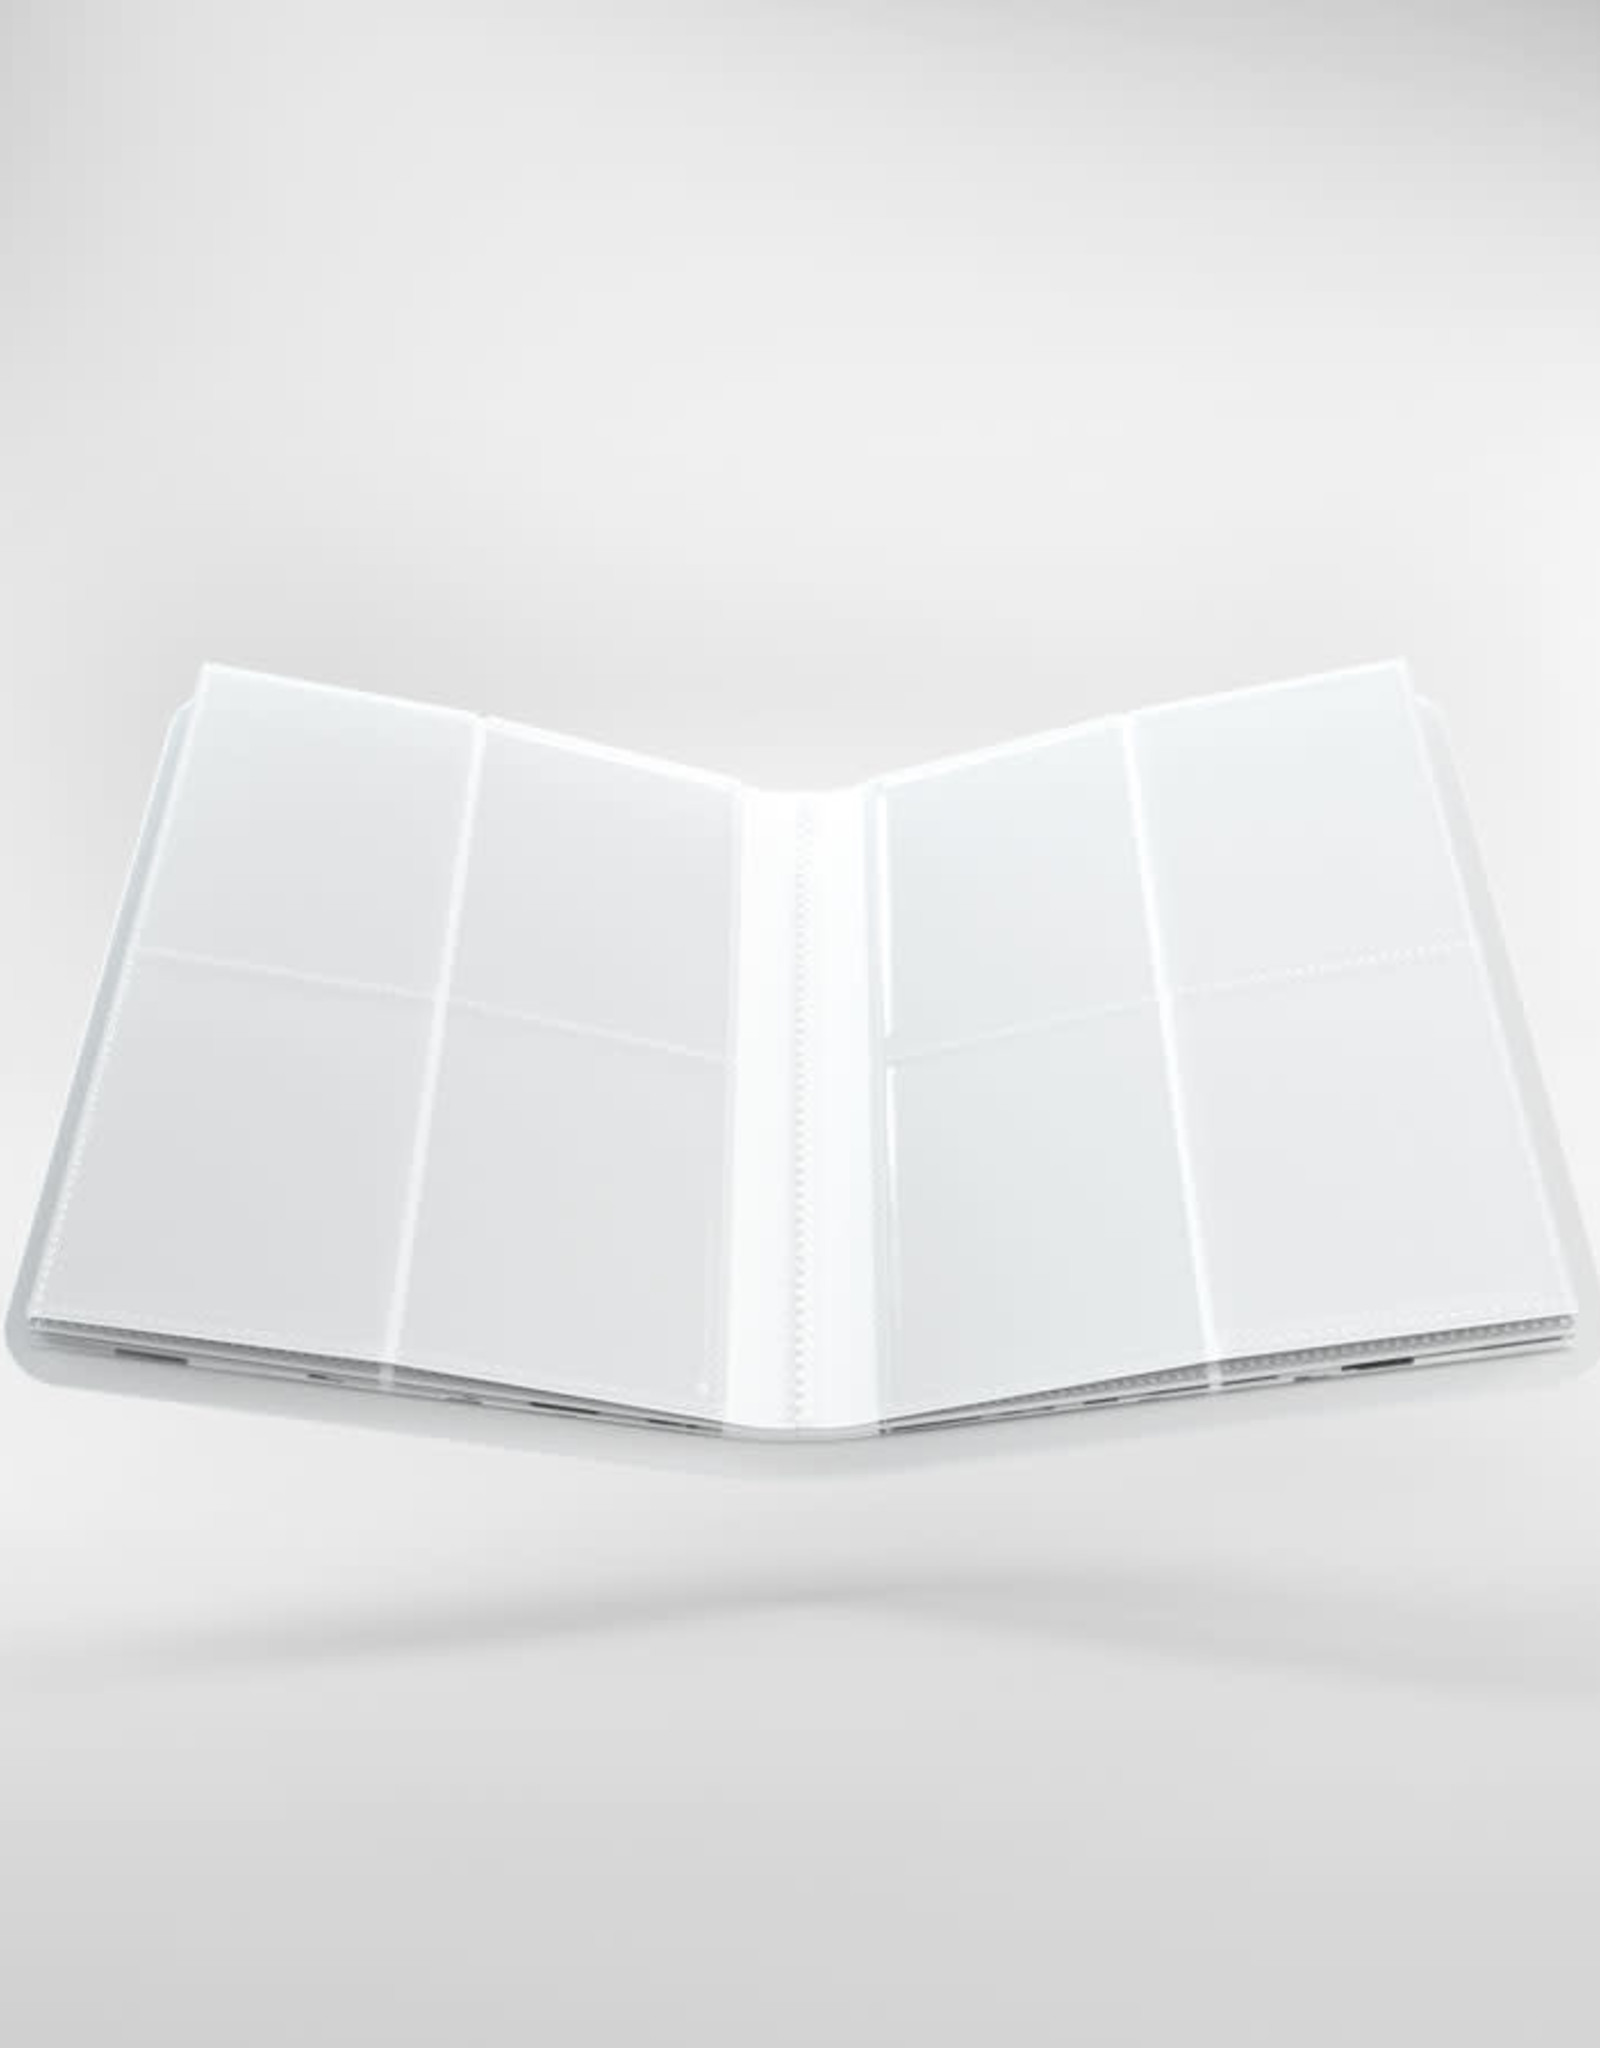 Casual Album: 8-Pocket Side-Loading White